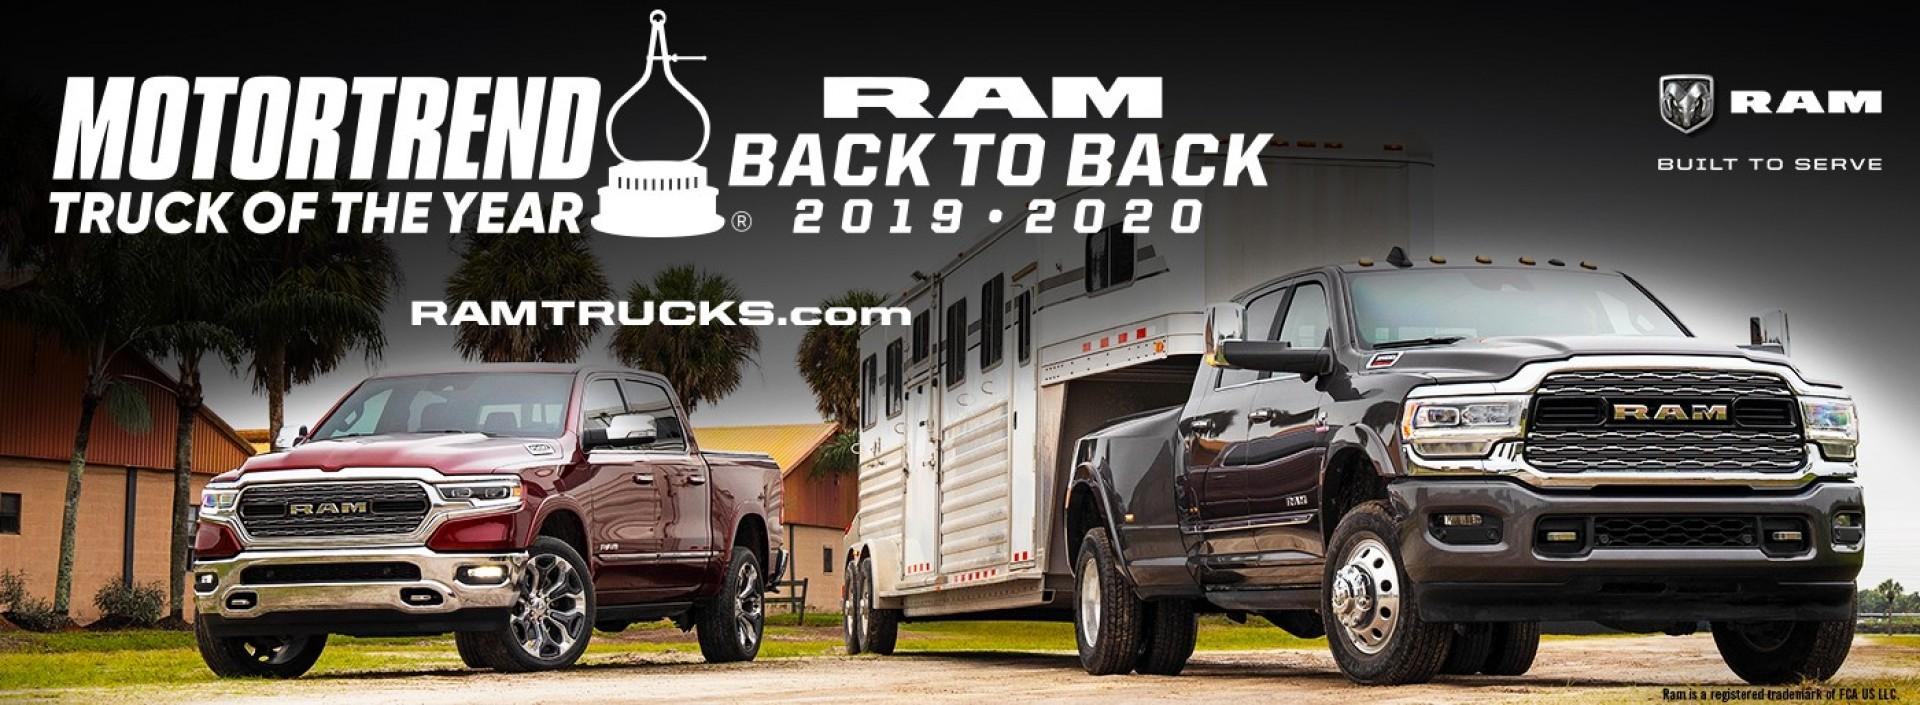 RAM Back to Back